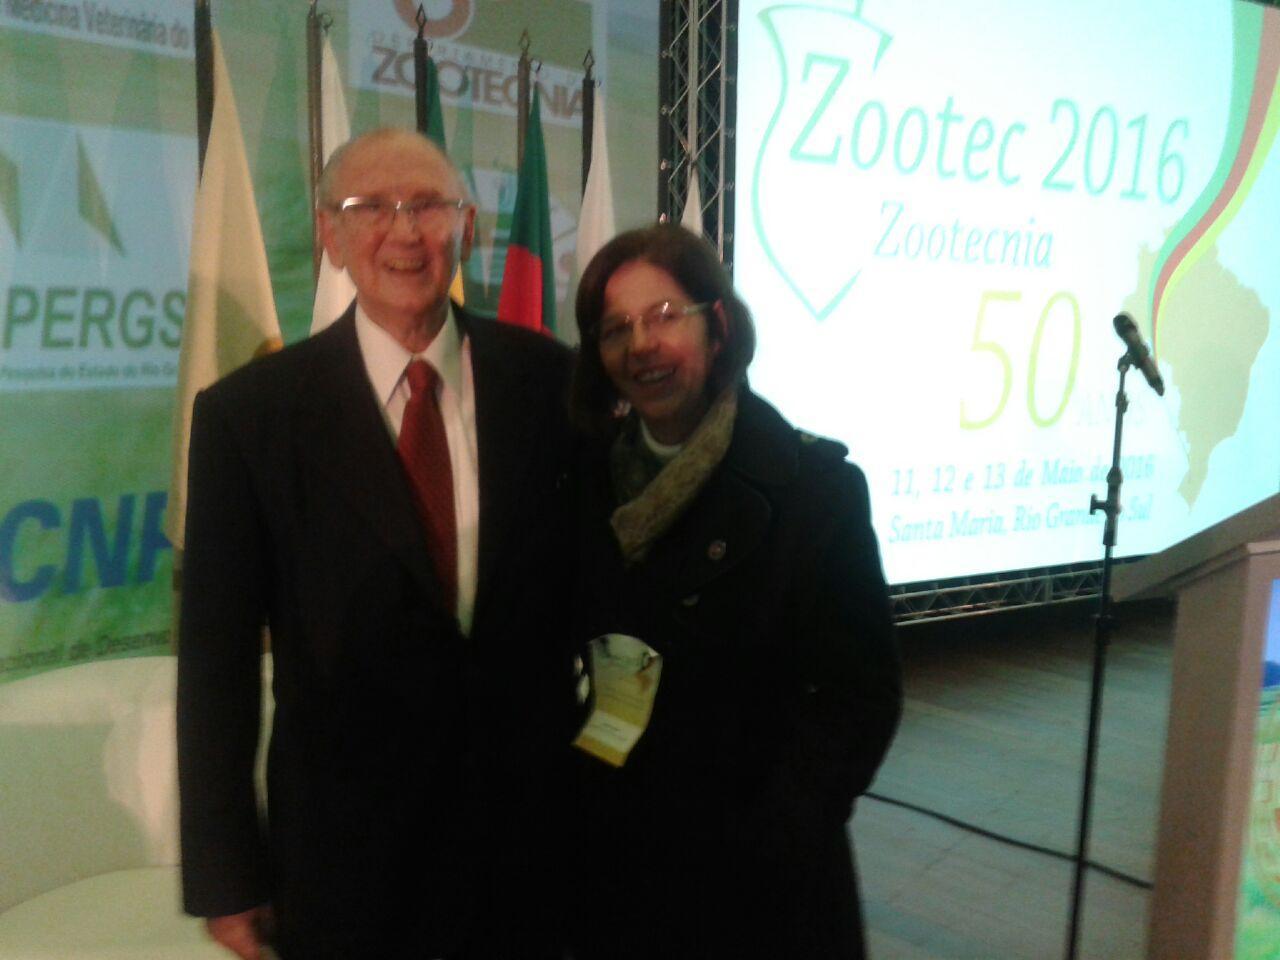 Reconhecimento do departamento de Zootecnia, ao professor José Francisco Sanchotene Felice – Patrono da Zootecnia Brasileira